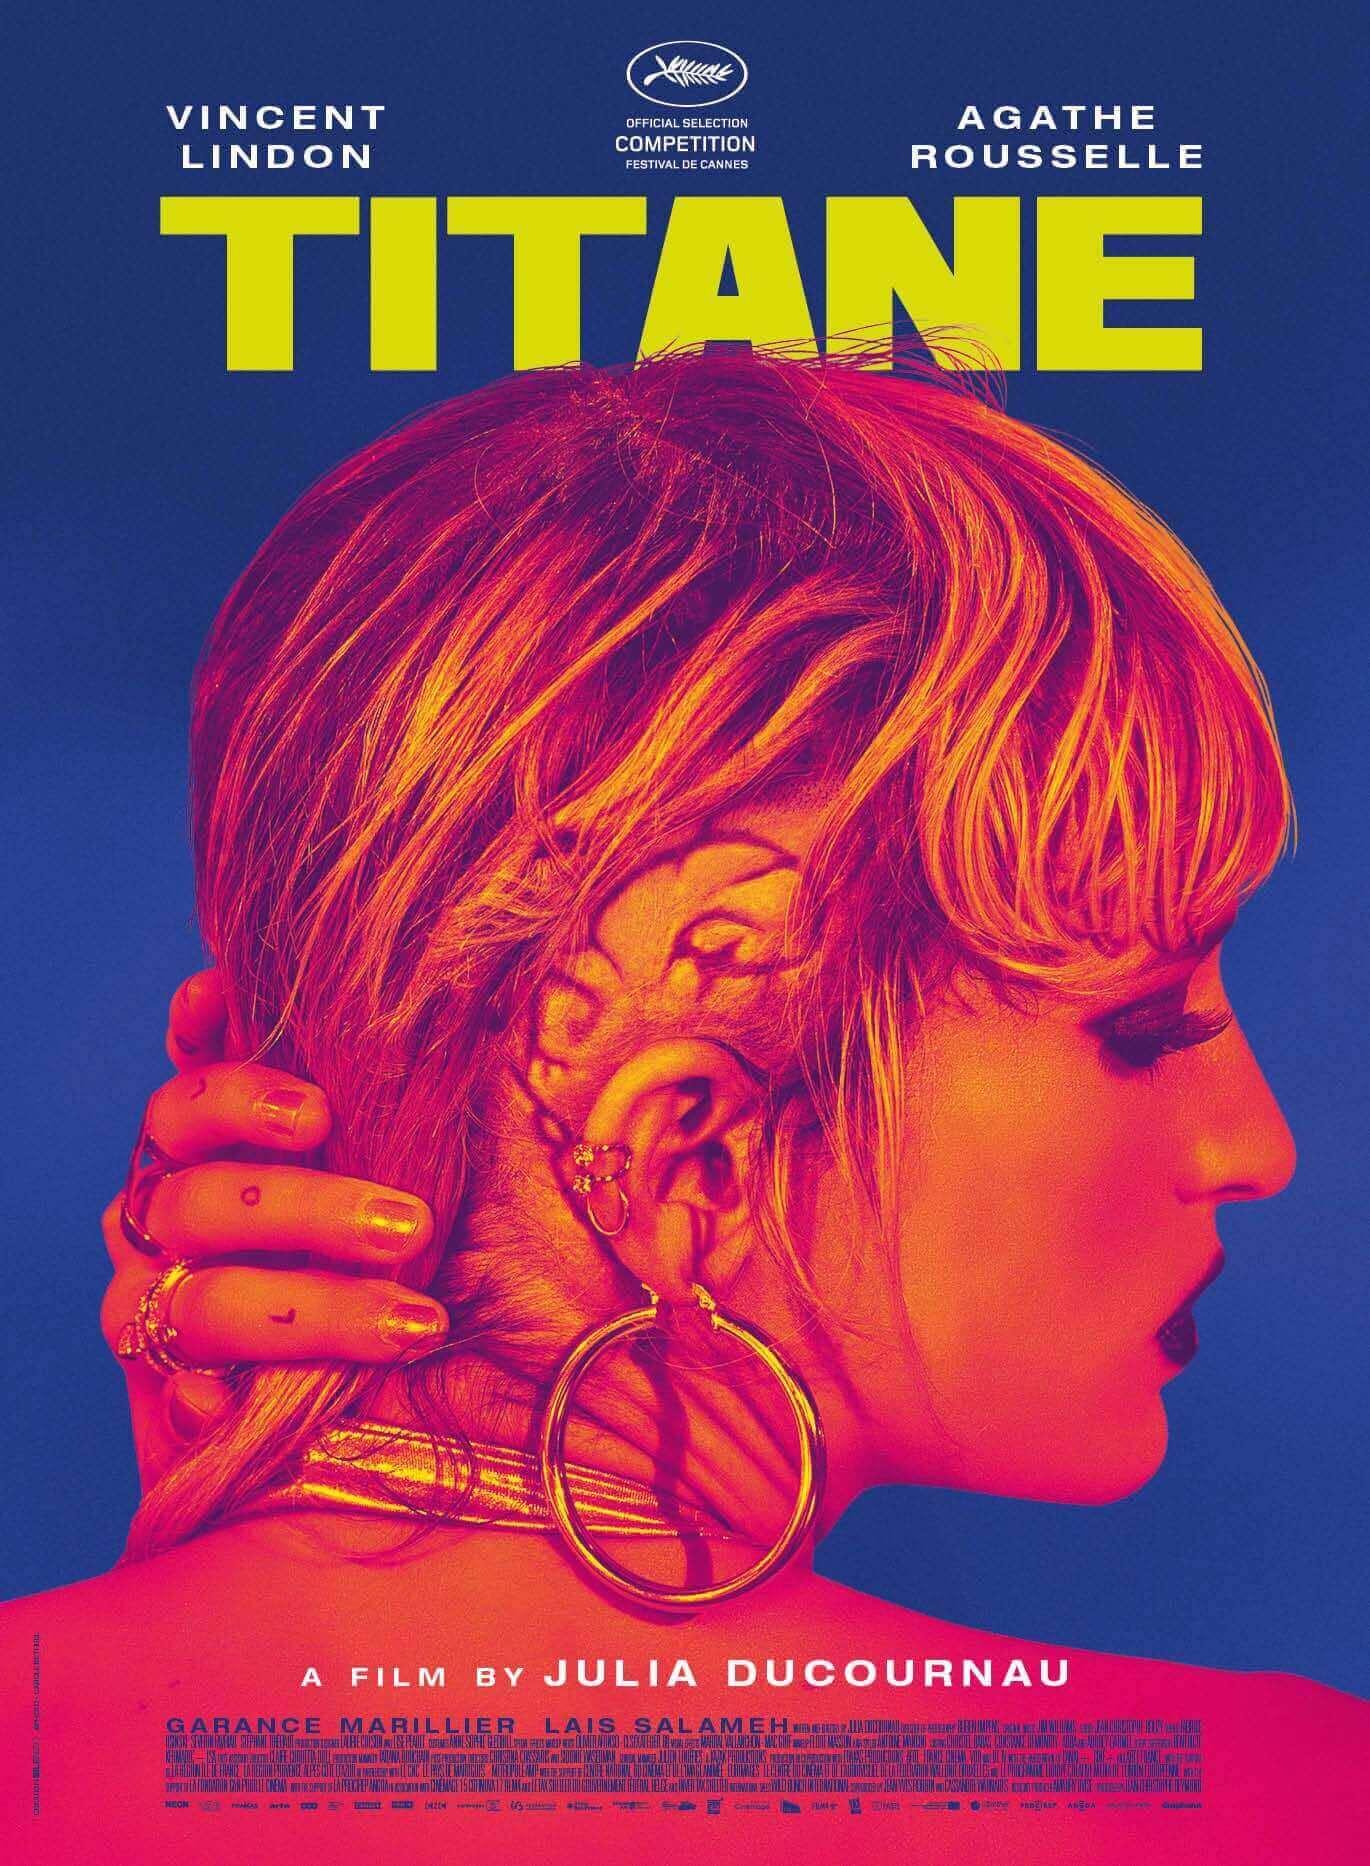 titane movie review 2021